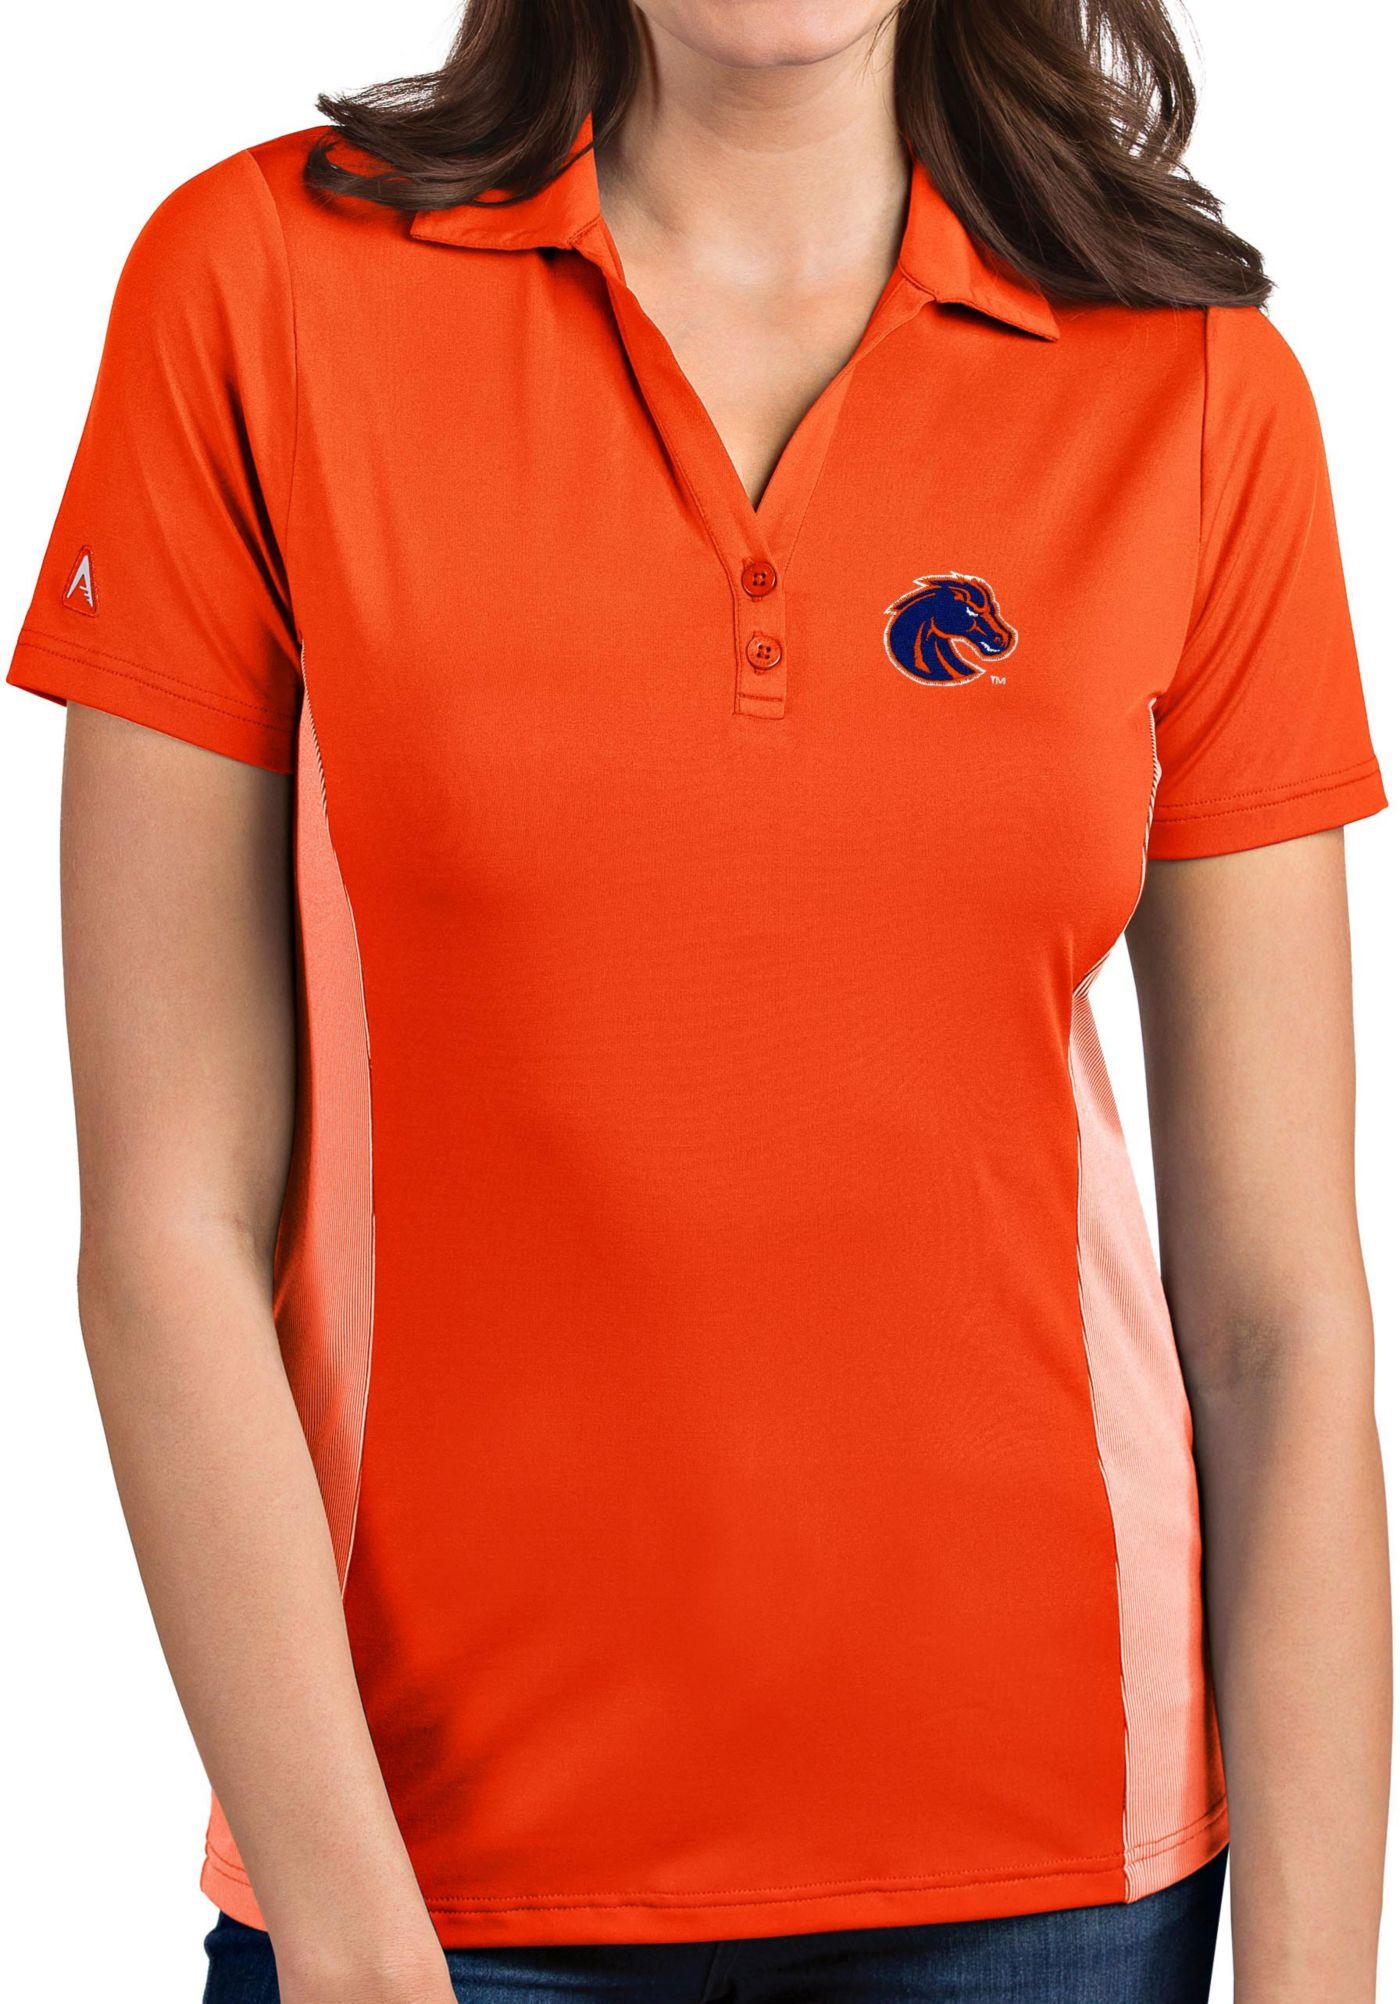 Antigua Women's Boise State Broncos Orange Venture Polo